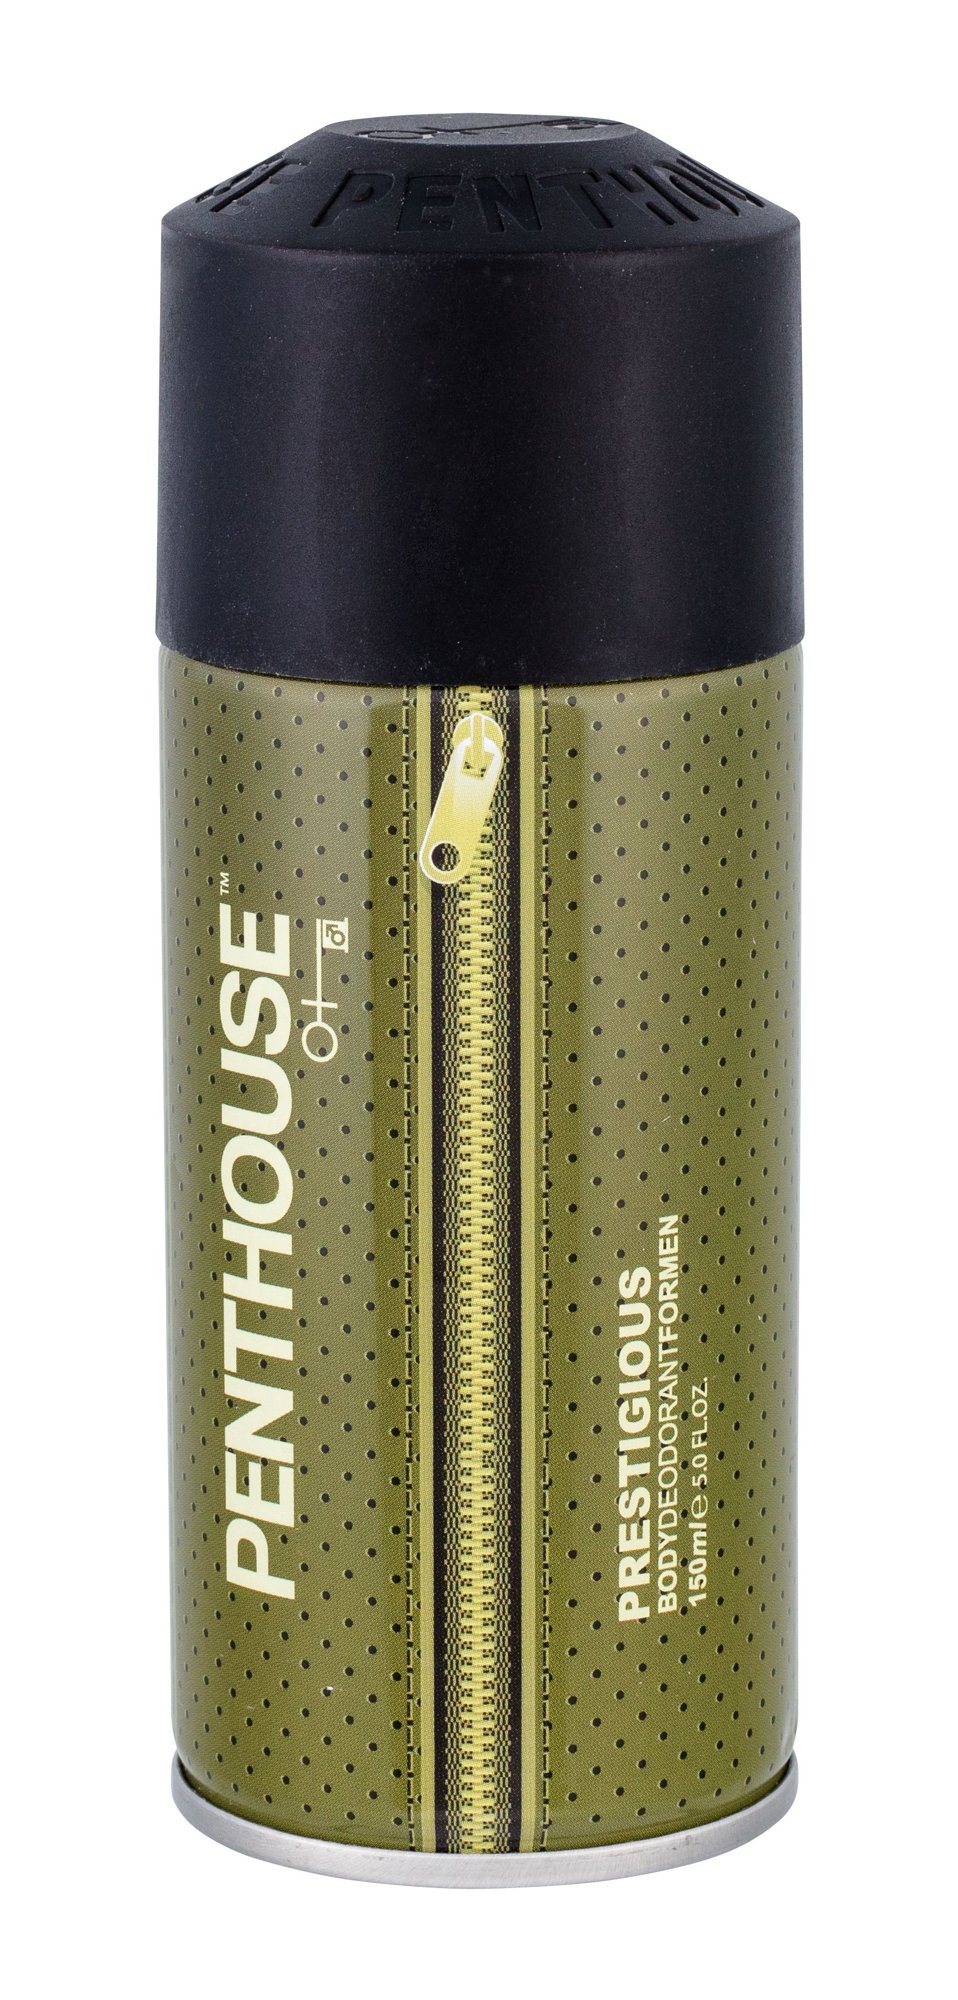 Penthouse Prestigious Deodorant 150ml